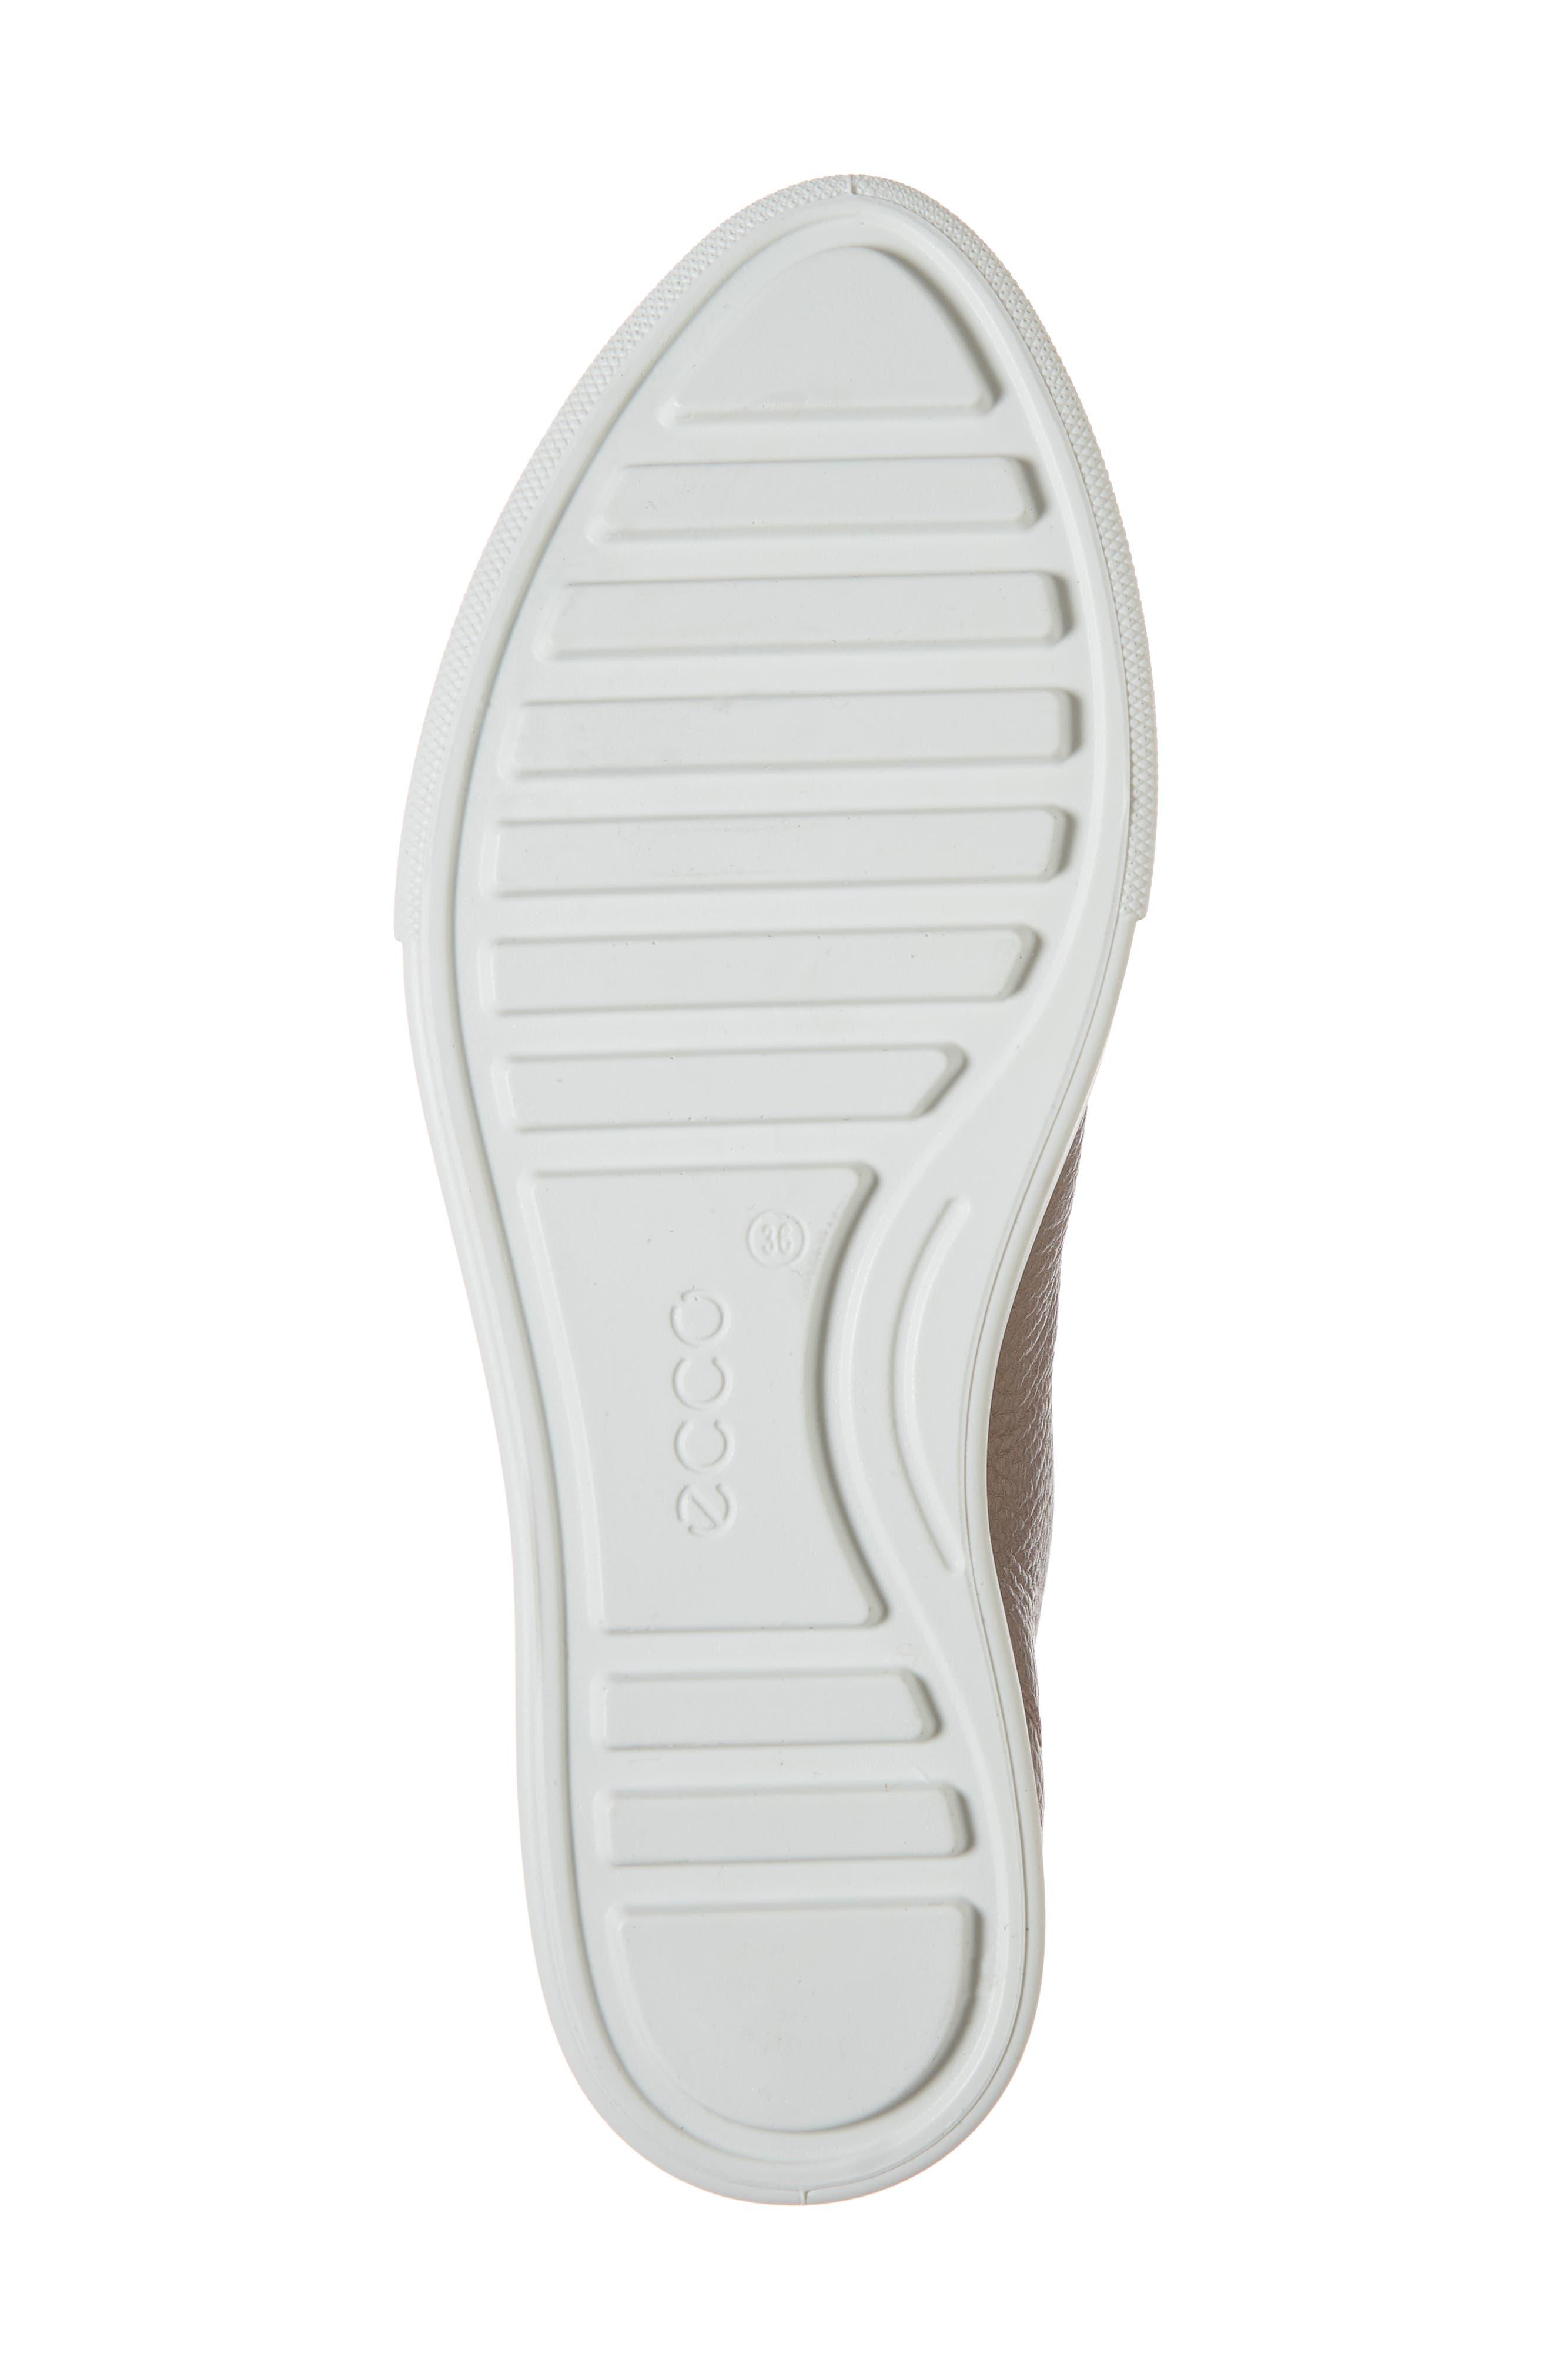 Gillian Sneaker,                             Alternate thumbnail 6, color,                             DEEP TAUPE/ BRONZE LEATHER